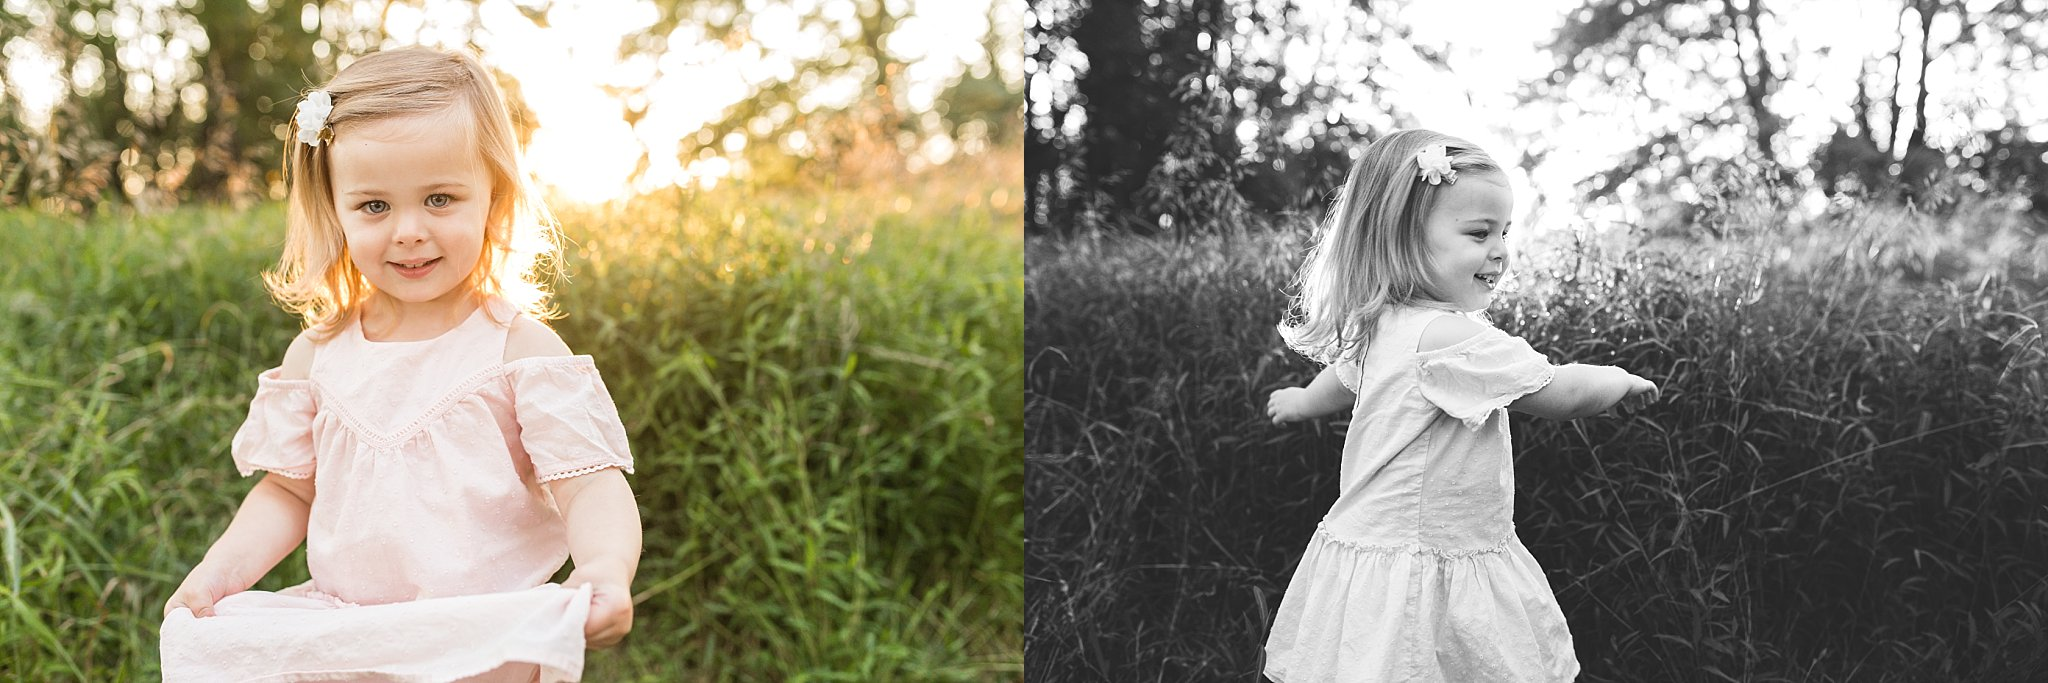 Lehigh Valley Child Photographer